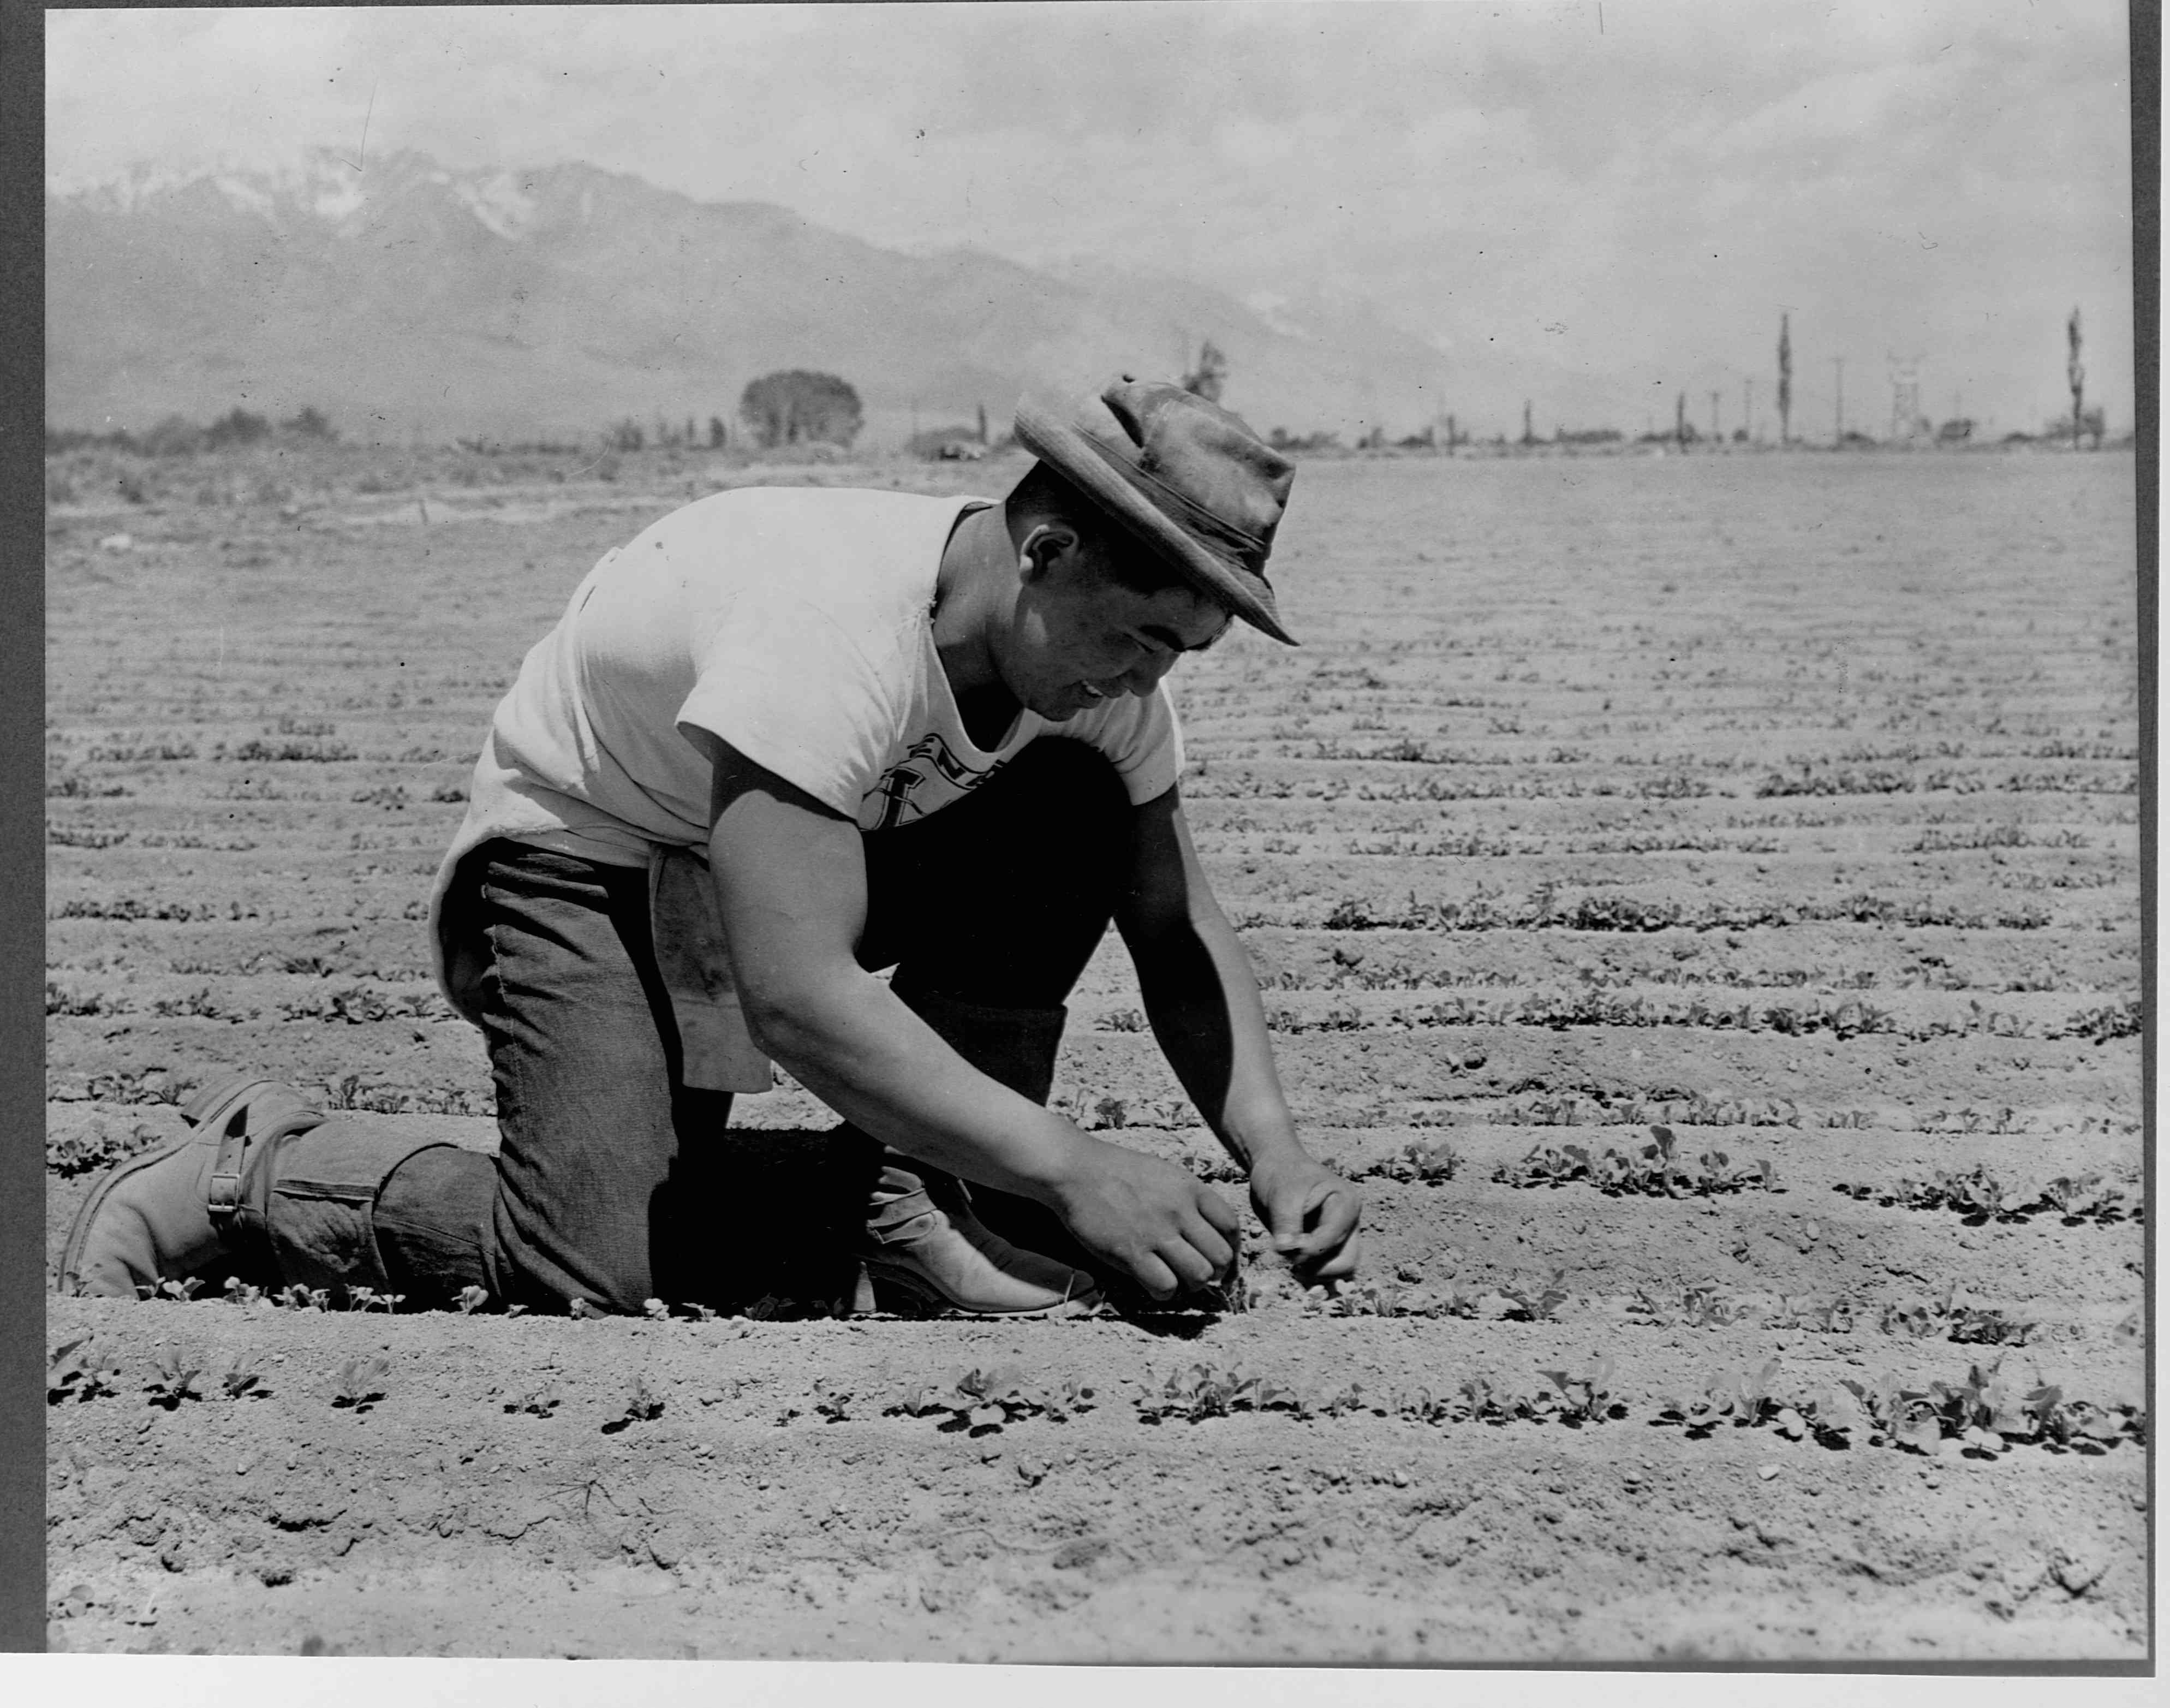 Ichiro Okumura Working in Field / Asian American Farming